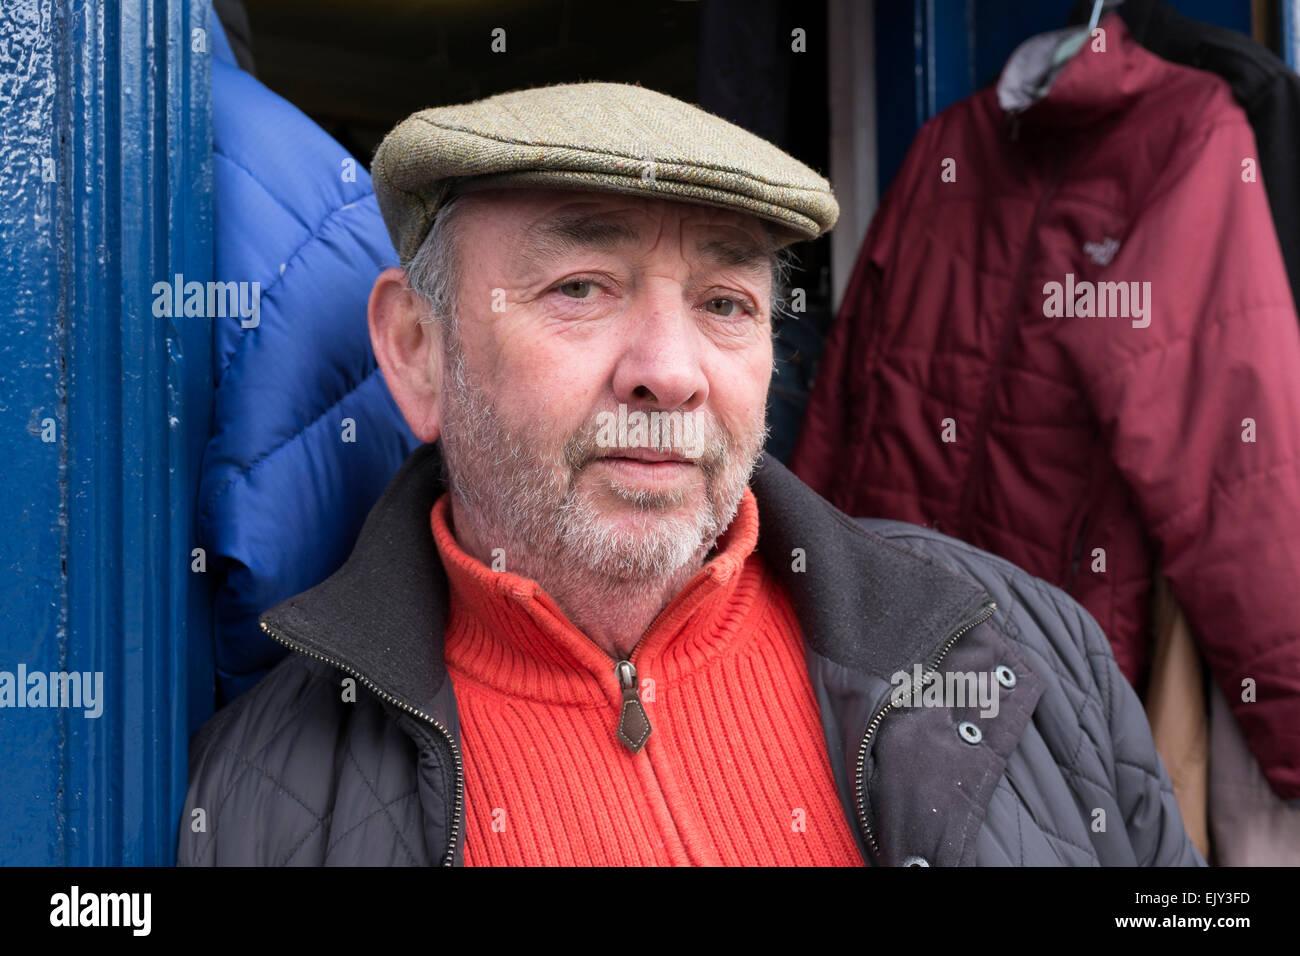 Secondhand clothes dealer outside his shop. Gallowgate, Glasgow, Scotland. - Stock Image